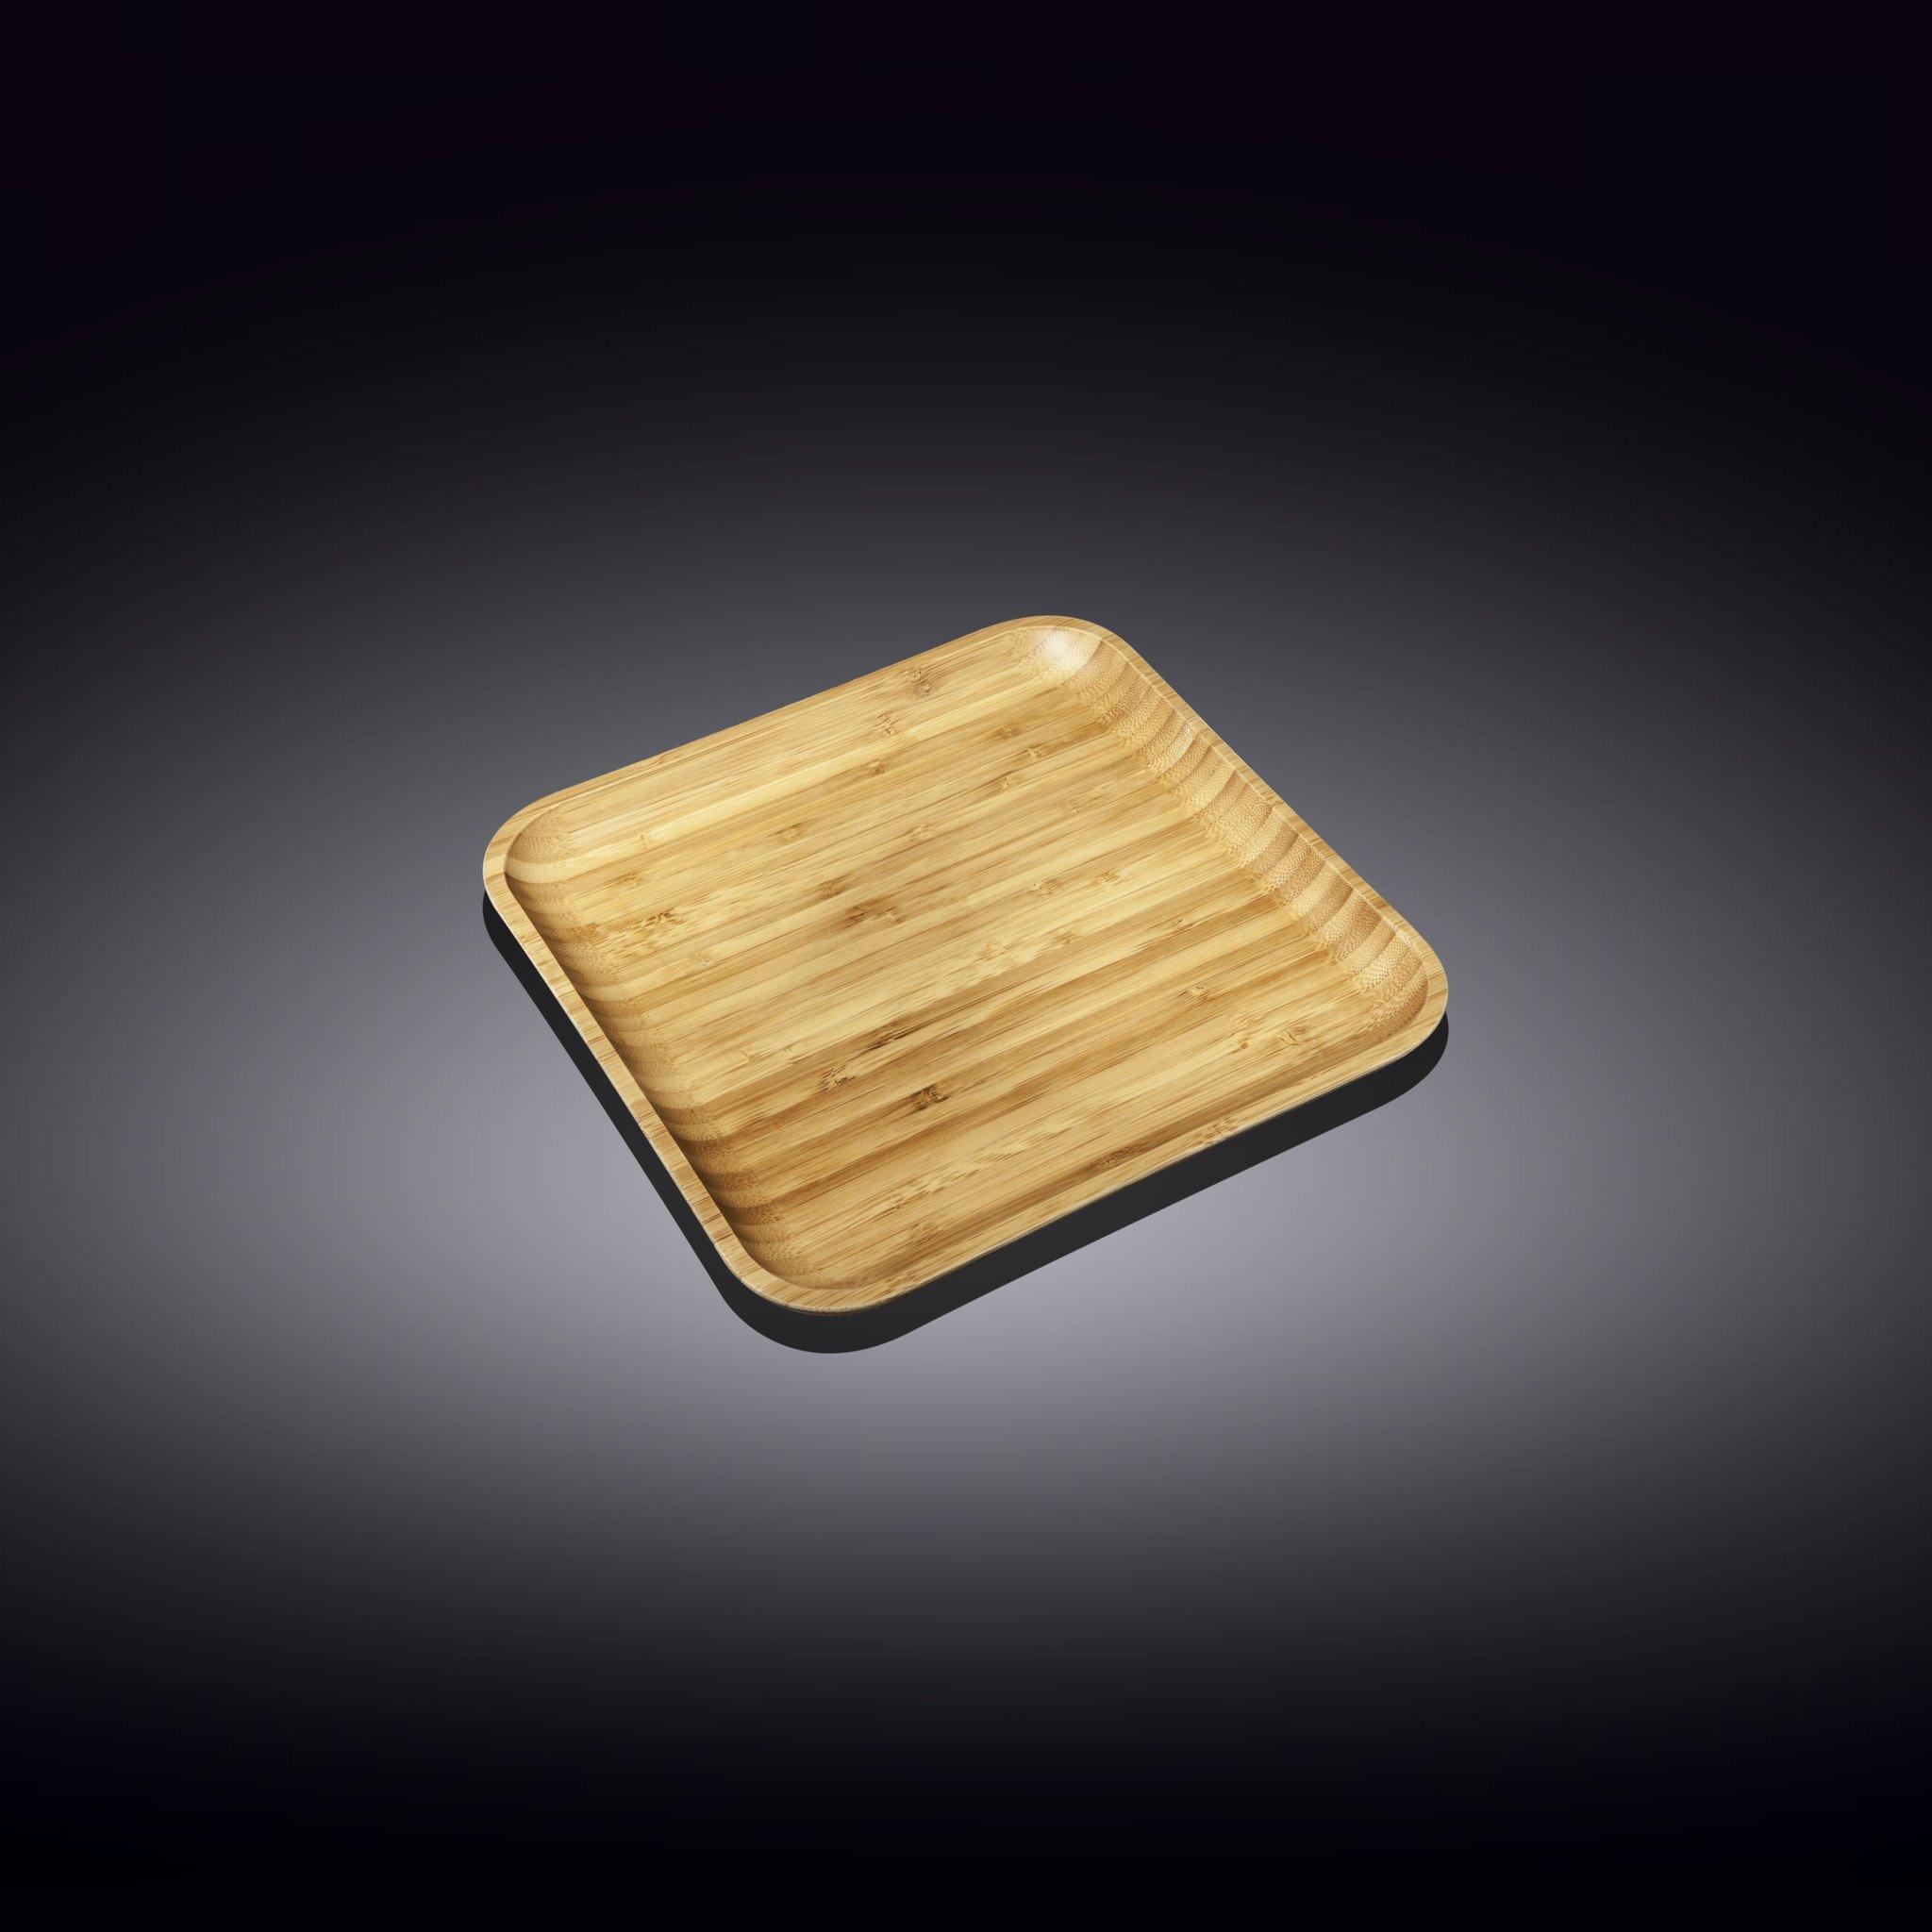 Тарелка бамбуковая Wilmax сервировочная квадратная 10 x 10 см